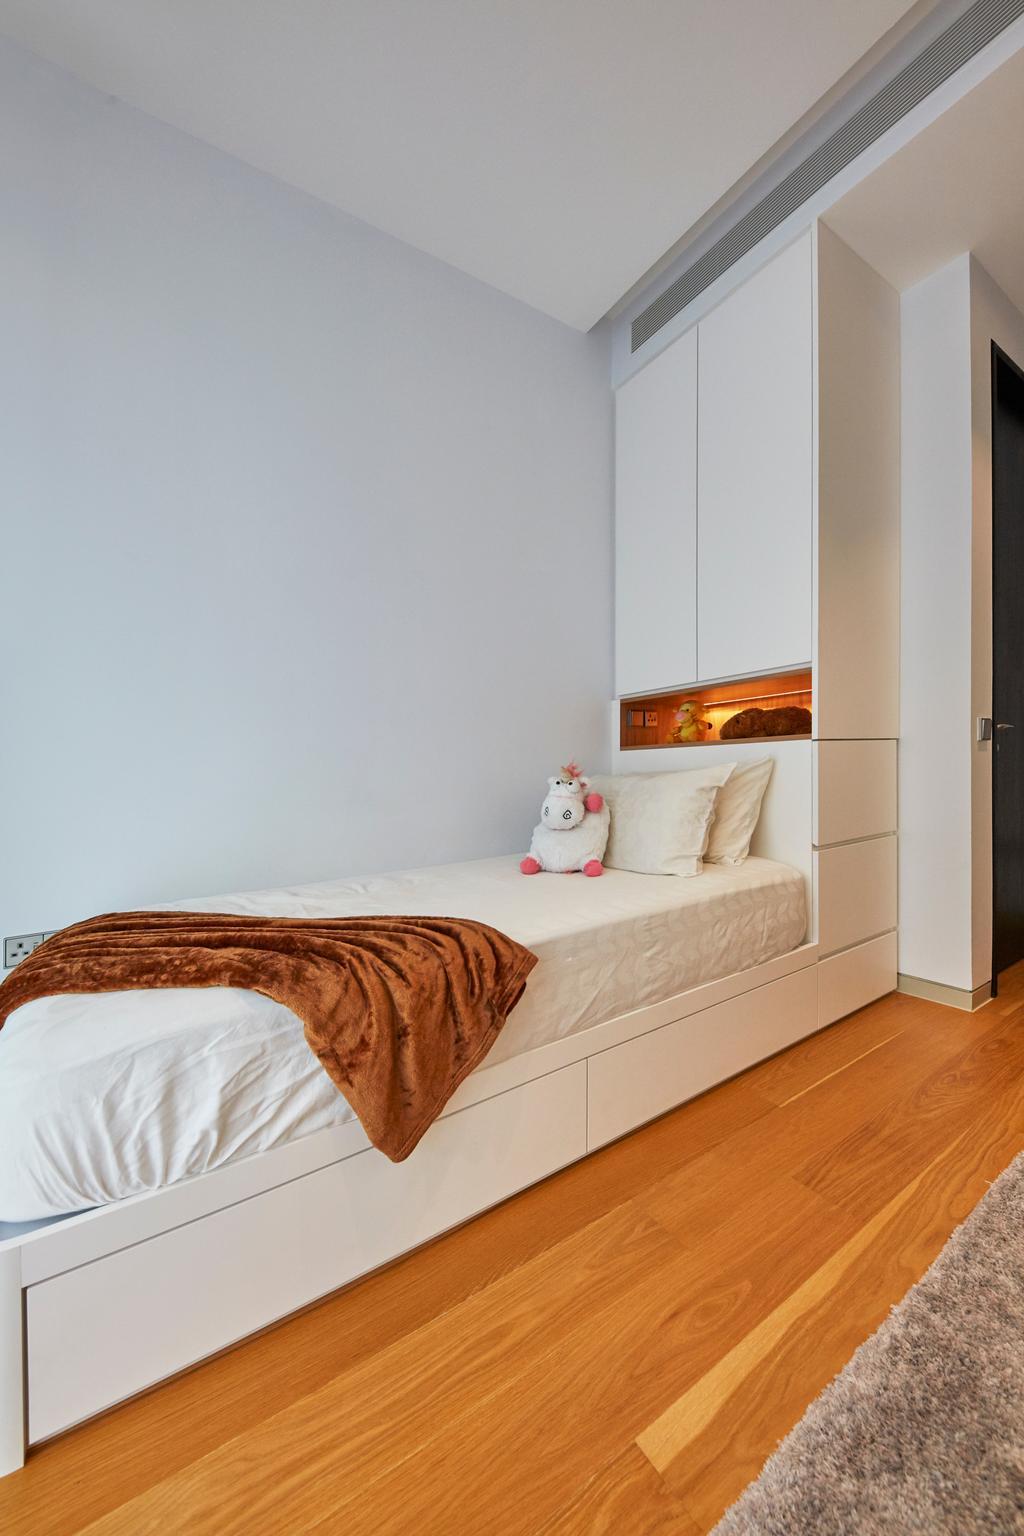 Contemporary, Condo, Bedroom, Corals at Keppel Bay, Interior Designer, Carpenters 匠, Bed, Furniture, Indoors, Interior Design, Room